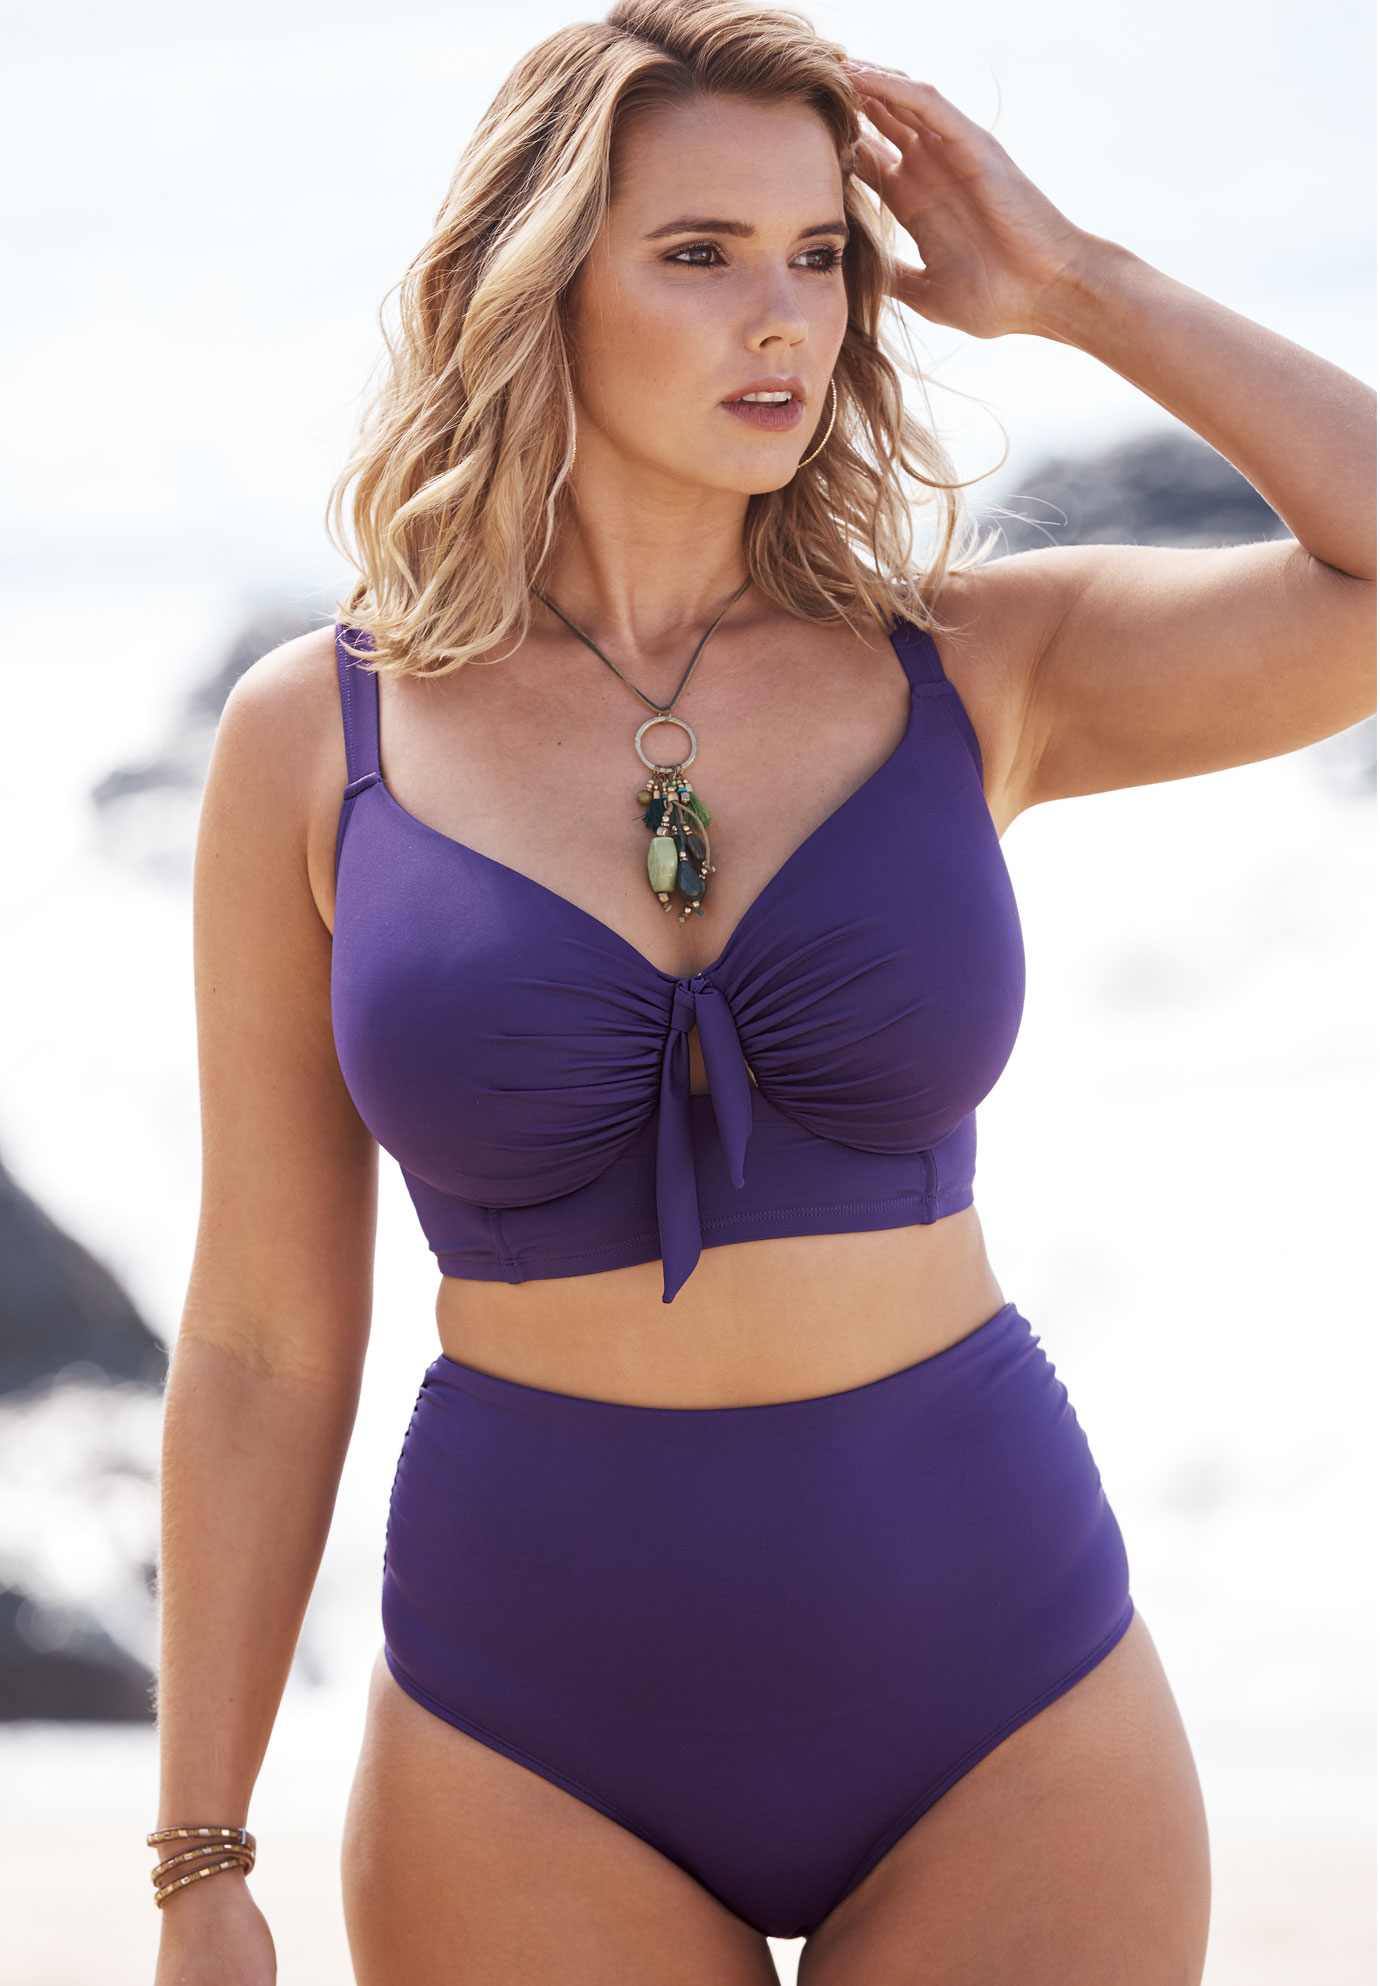 dde6a7f03ffb1 Longline Bikini Top  Plus Size Active & Swimwear   Full Beauty